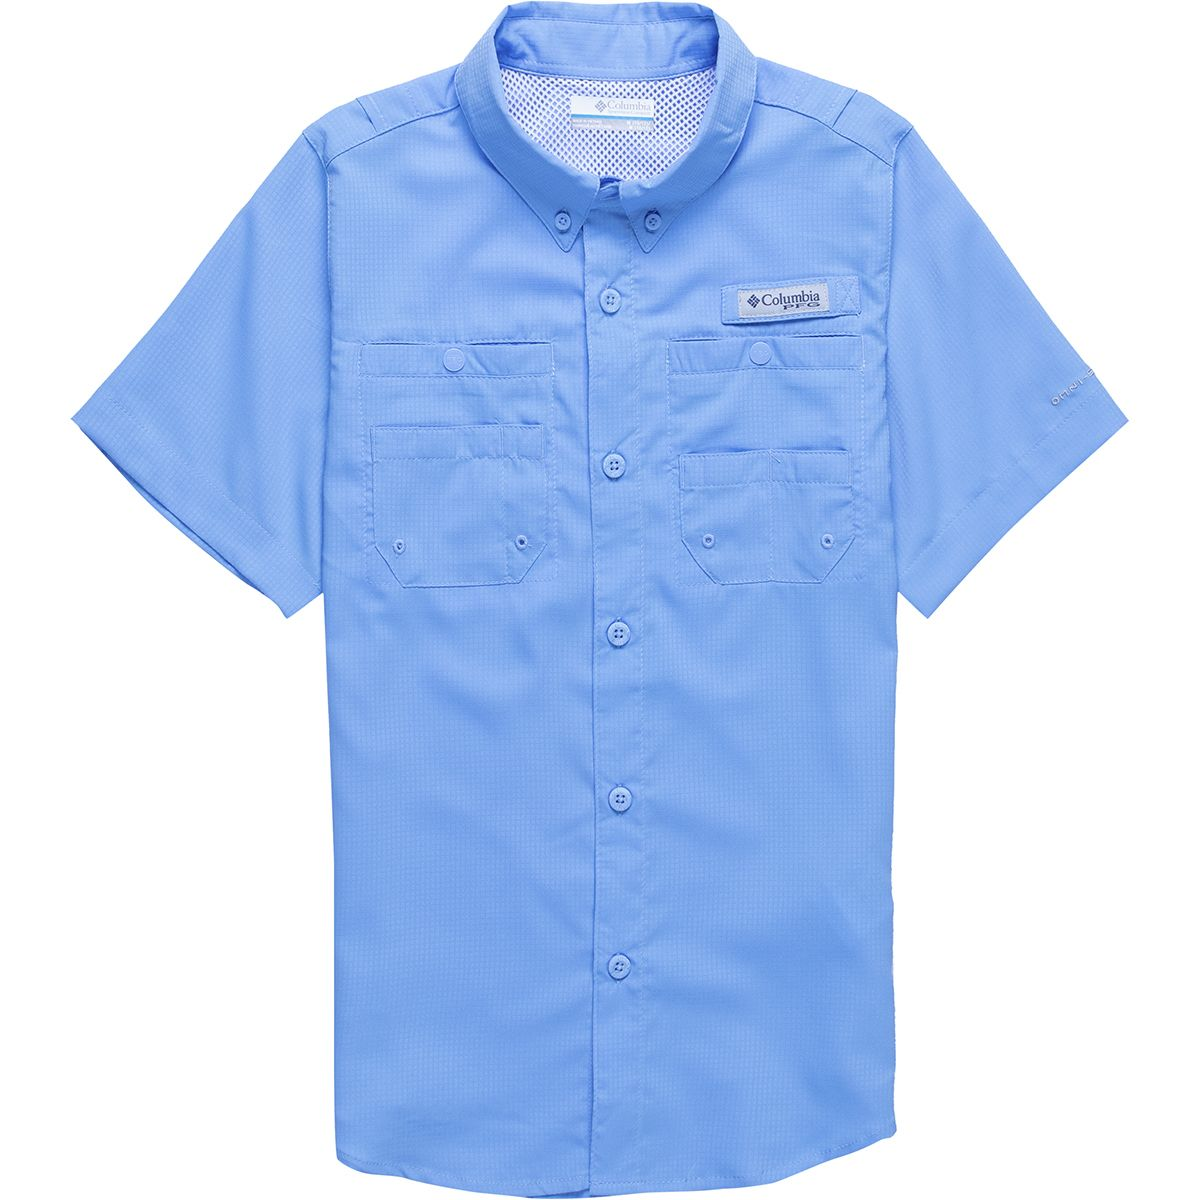 Columbia Tamiami Short Sleeve Shirt